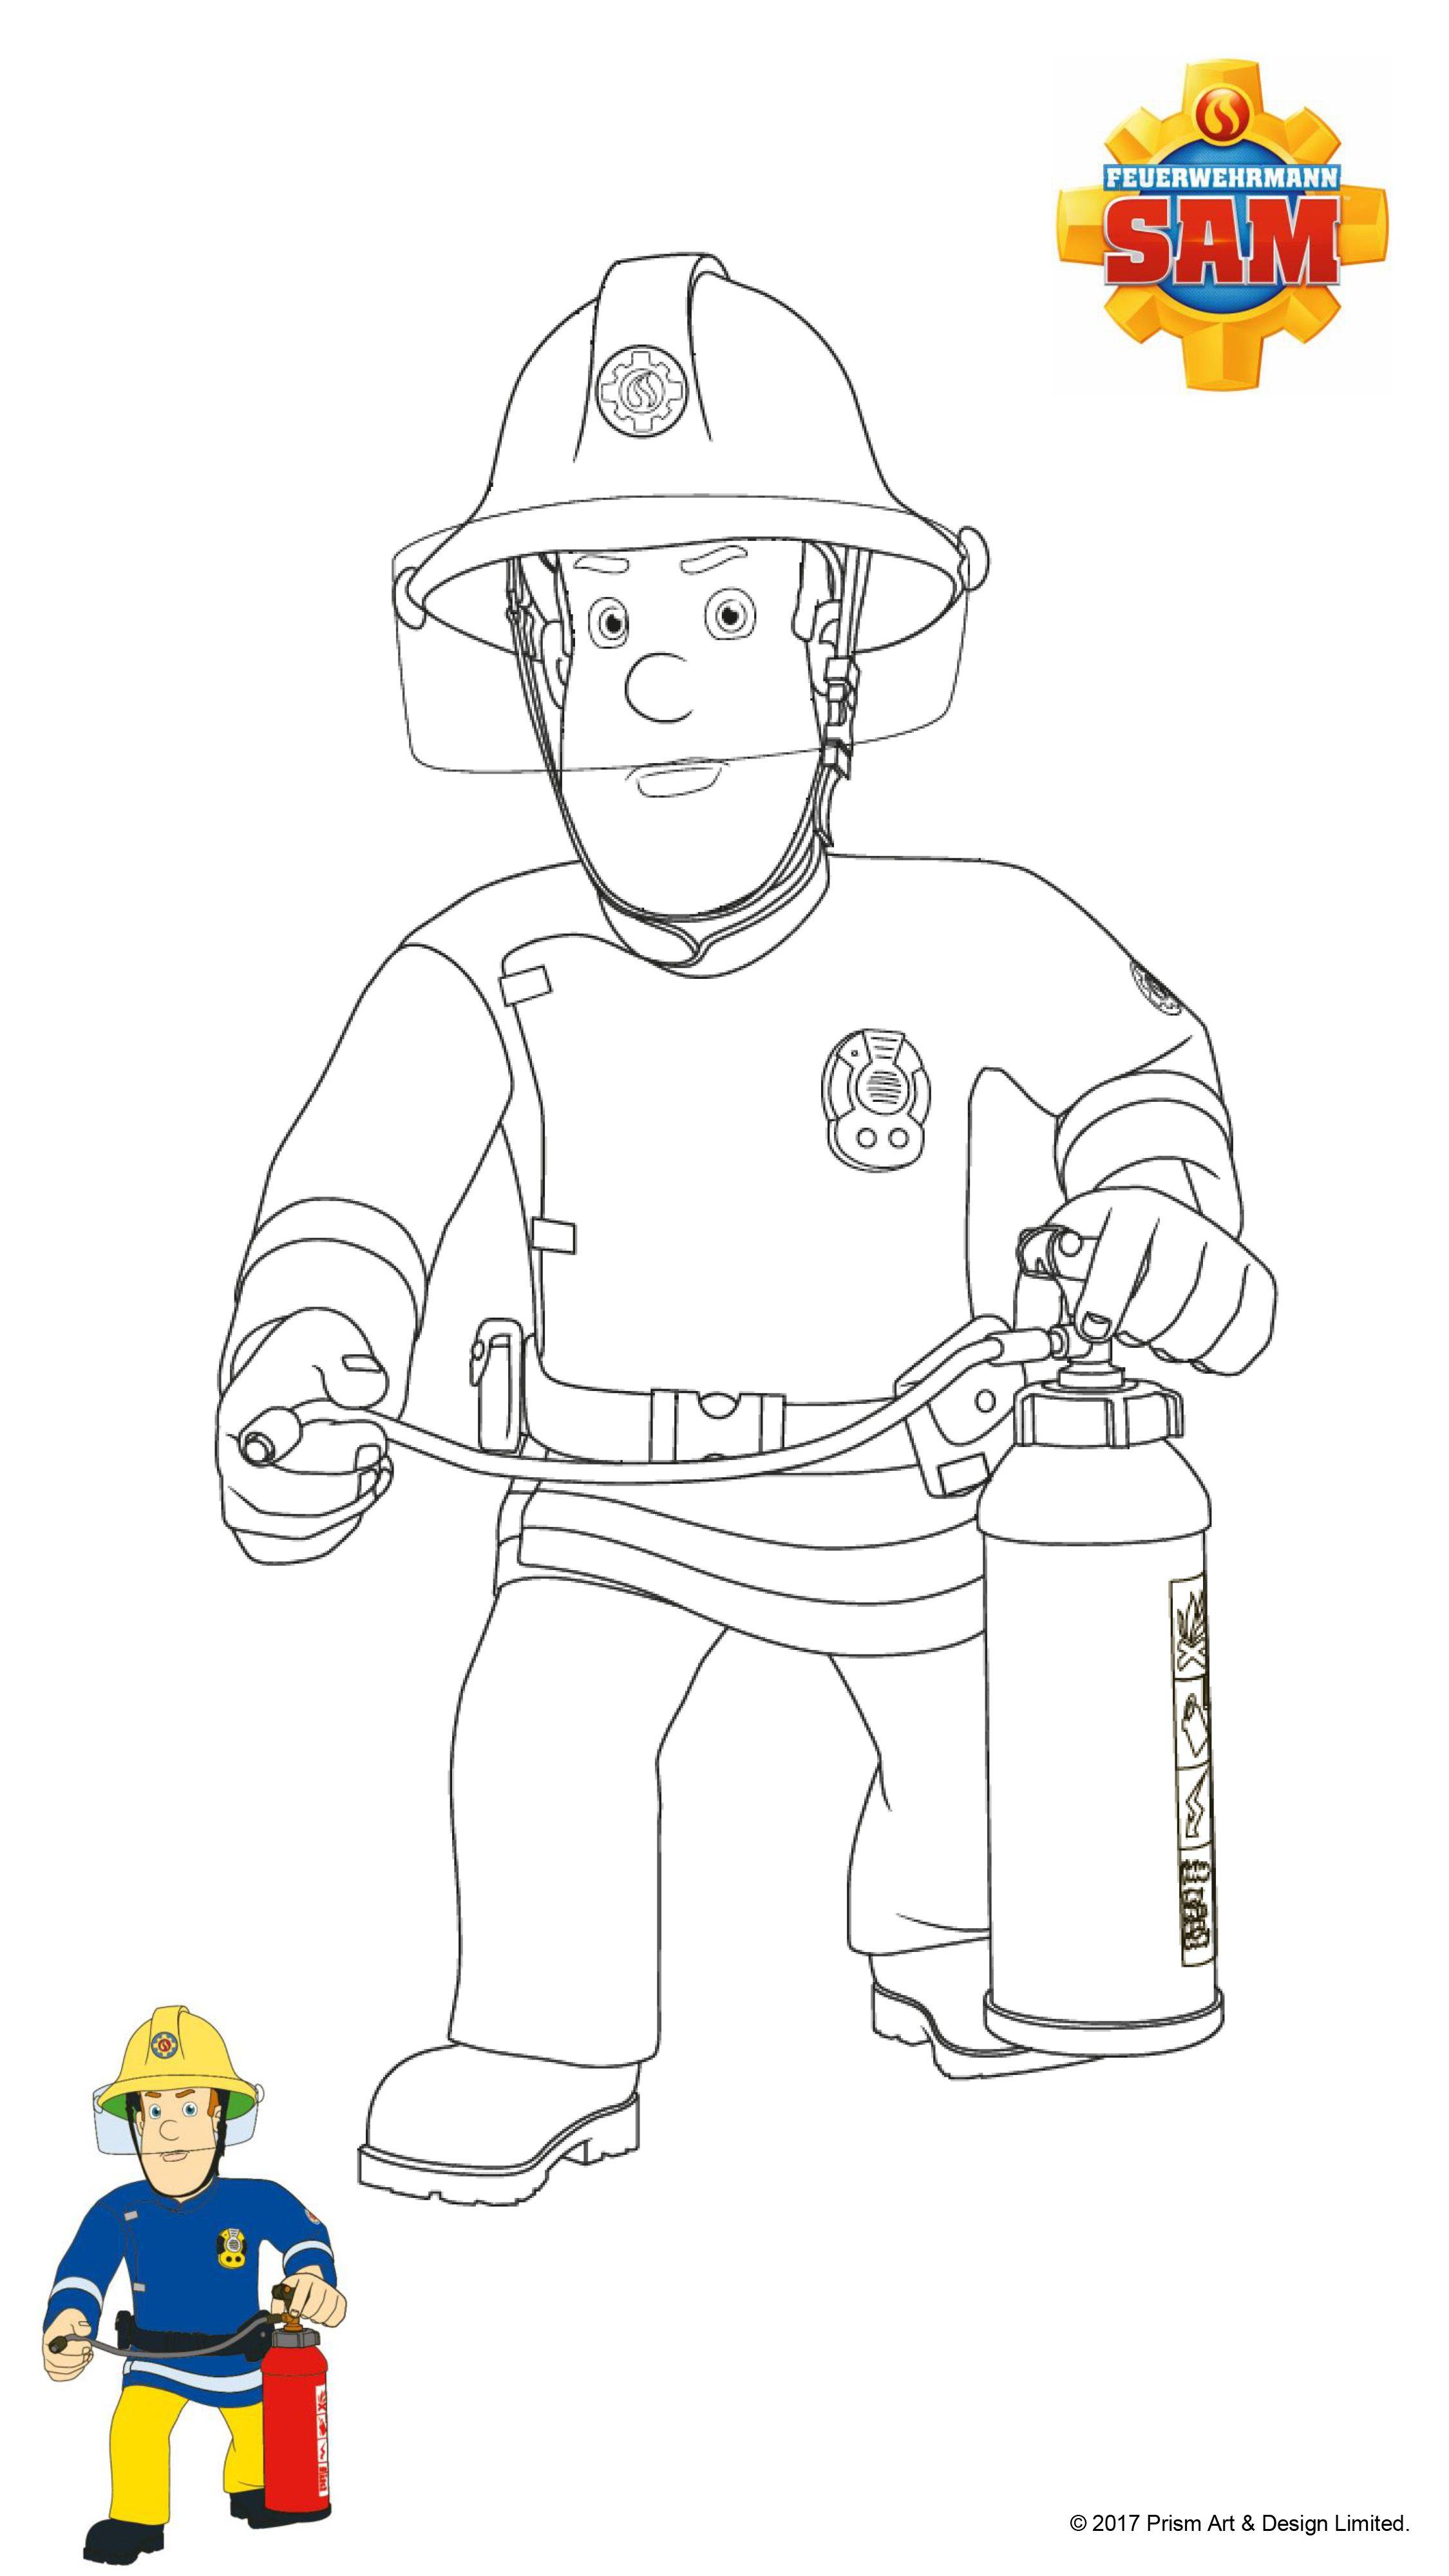 Feuerwehrmann Sam Ausmalbilder  myToys Blog in 8